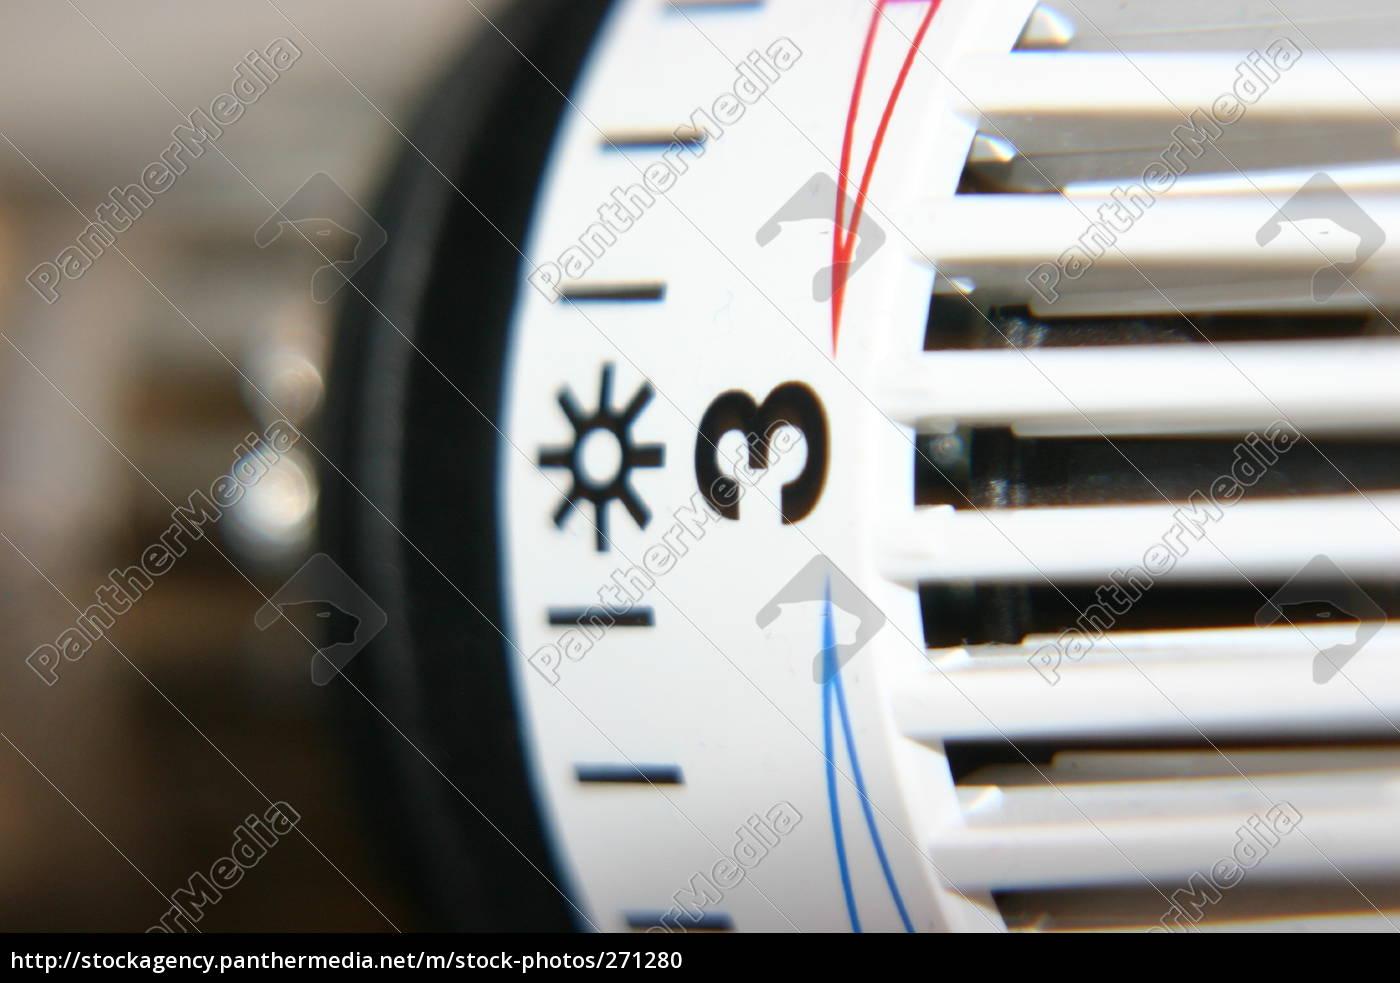 thermostat - 271280